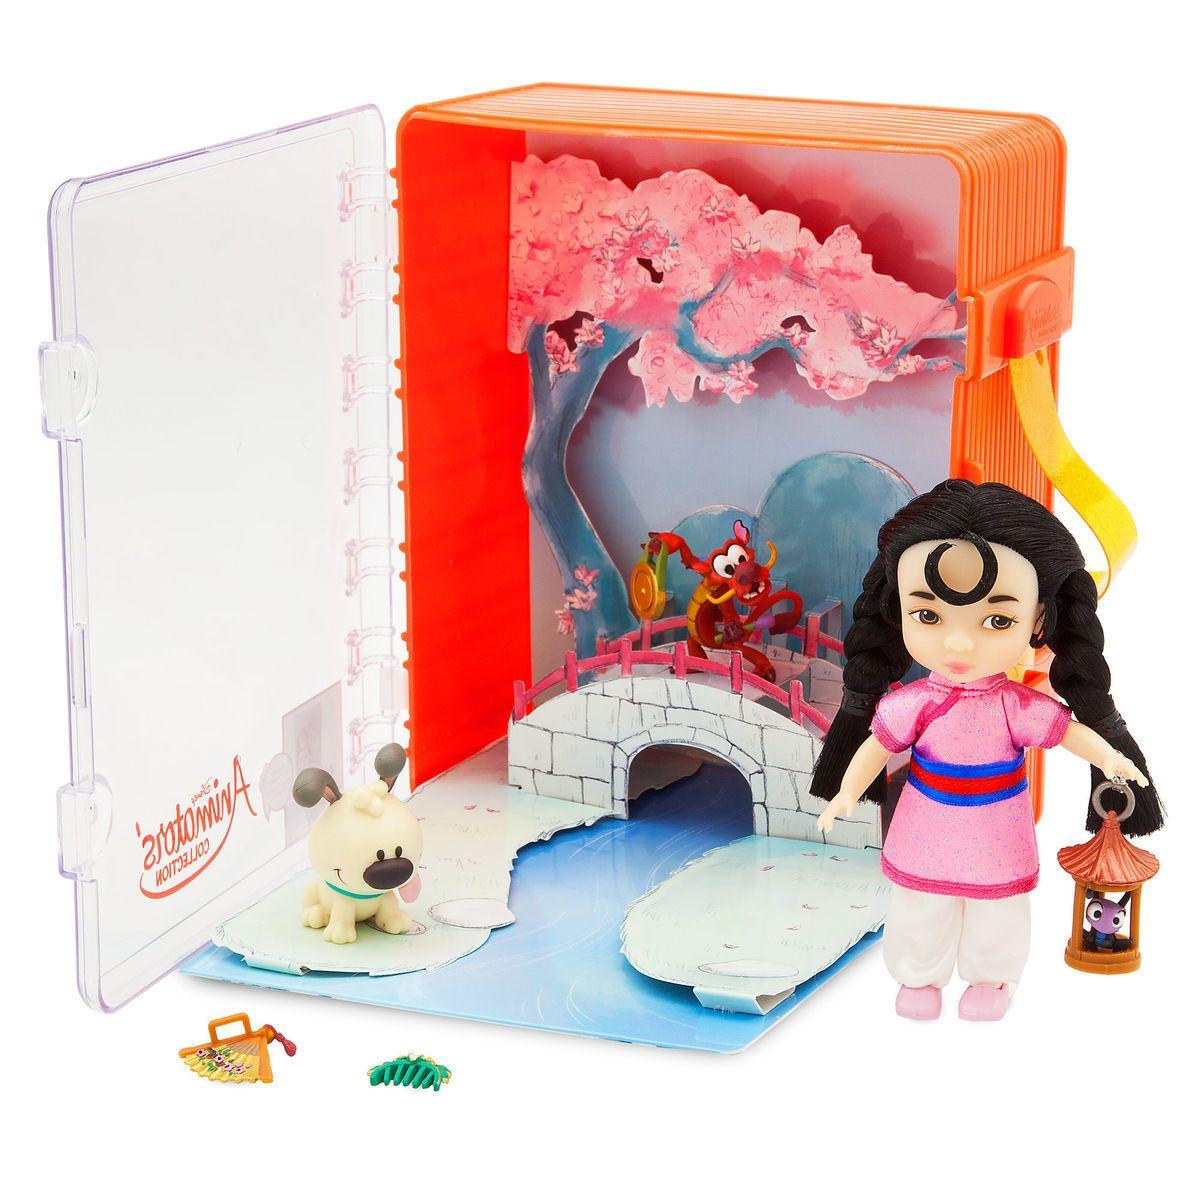 Disney Parks Store Animators/' Collection Mini Doll Play Set Elsa Frozen NEW